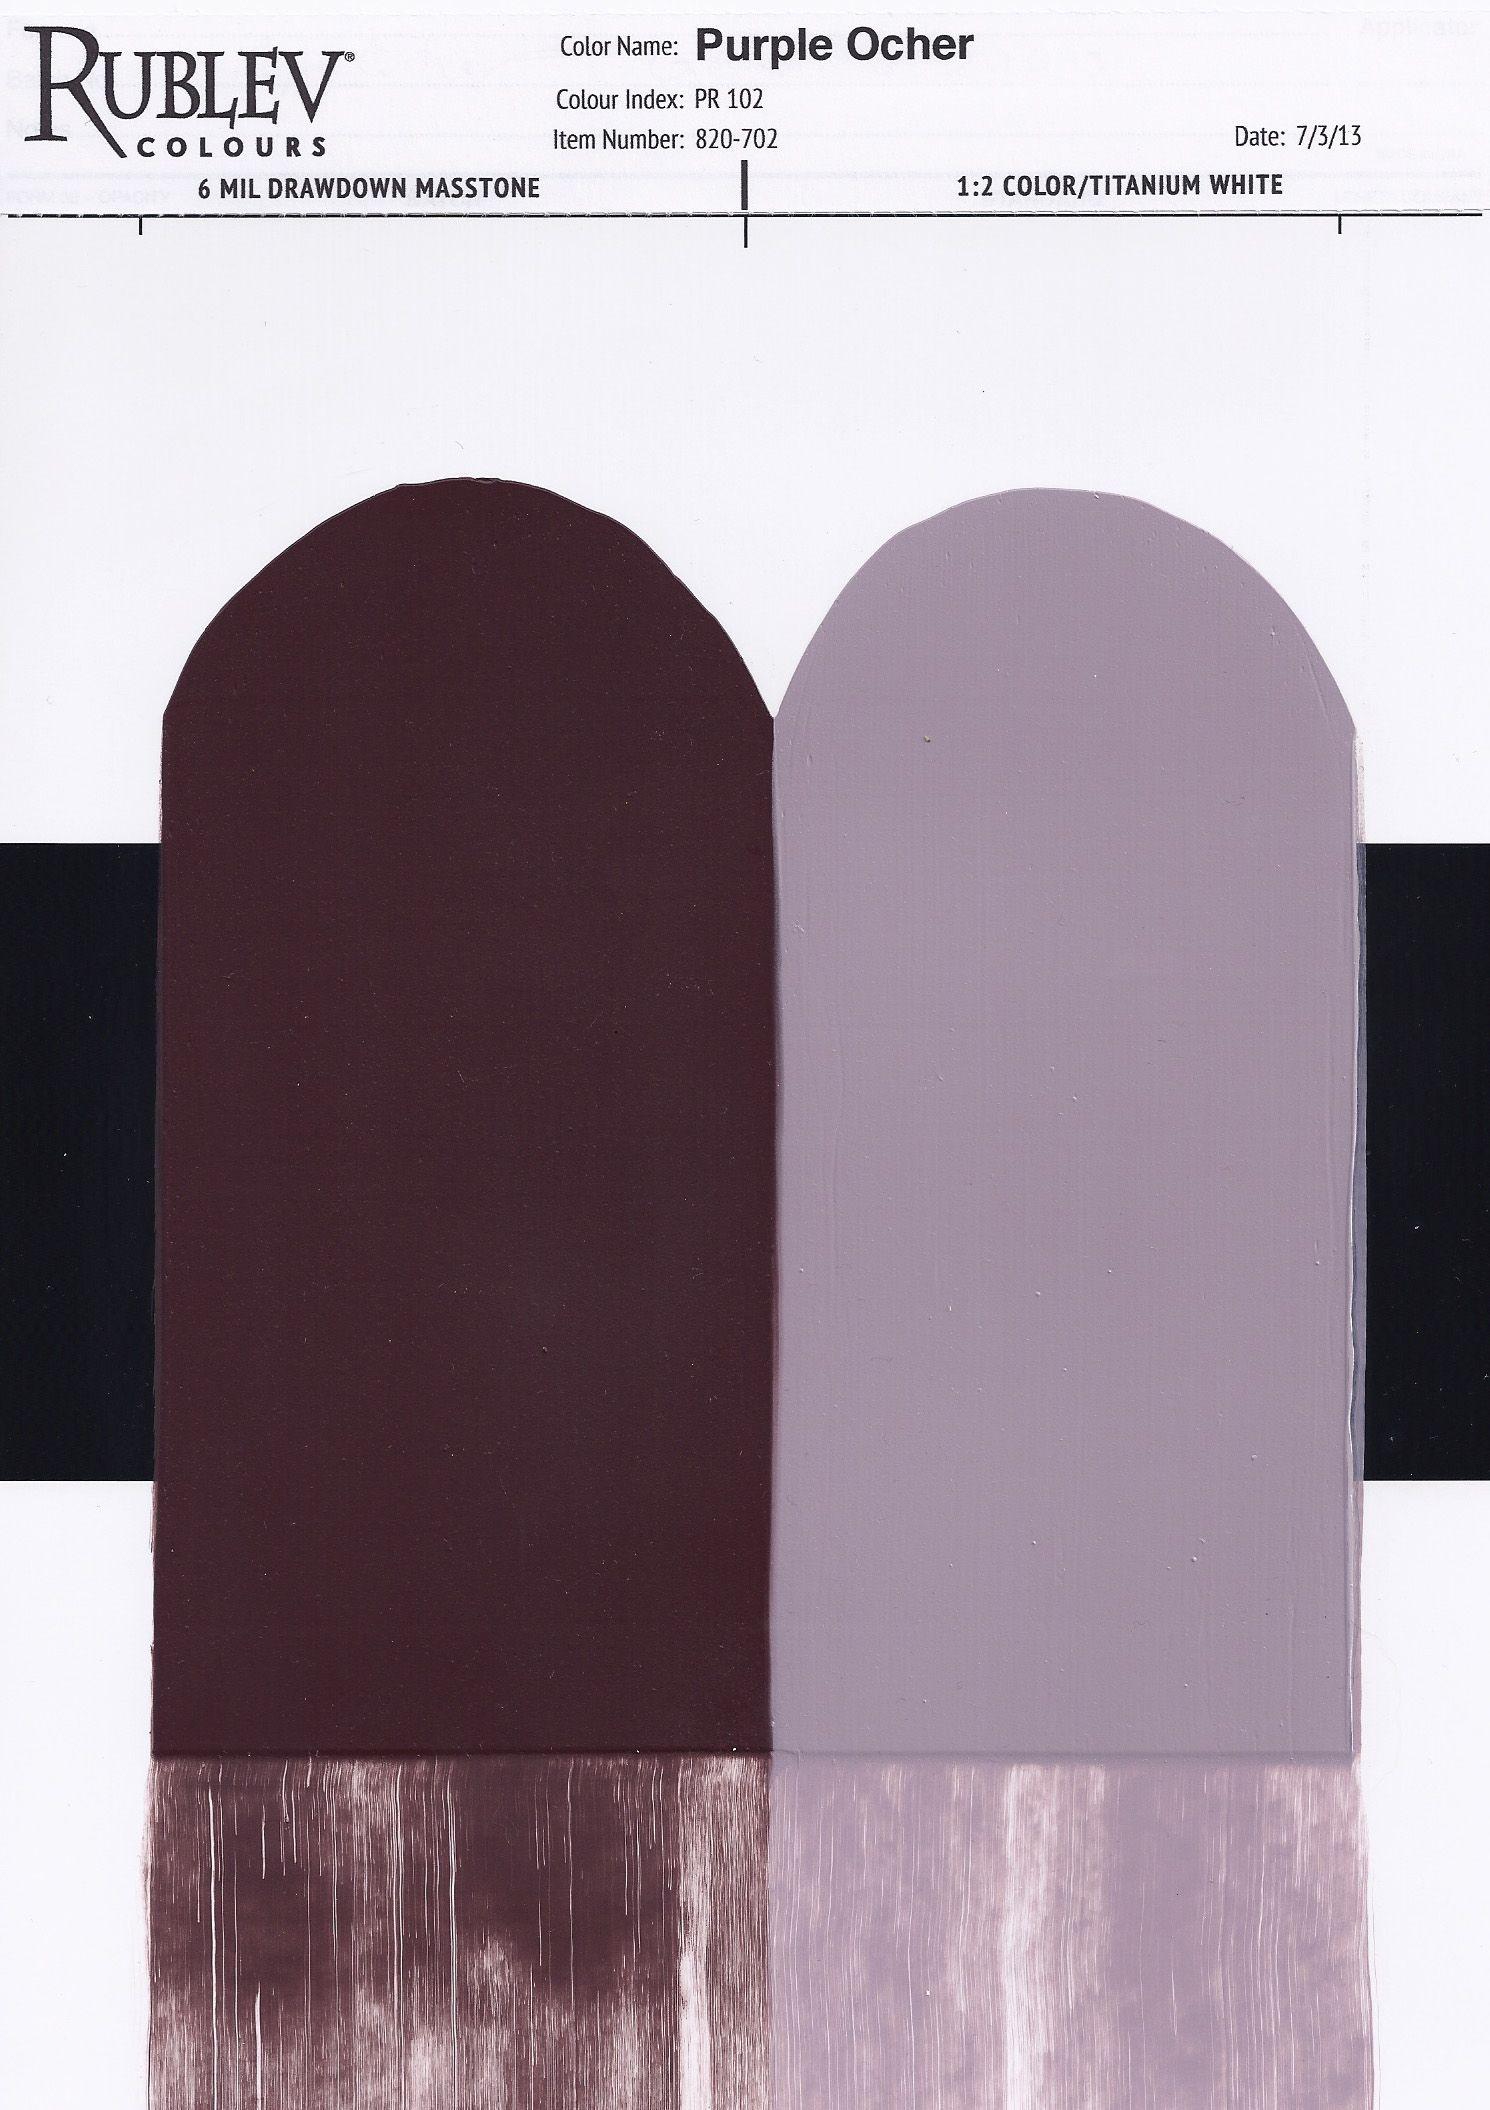 Rublev Colours Oleogel Rublev Colours Purple Ocher